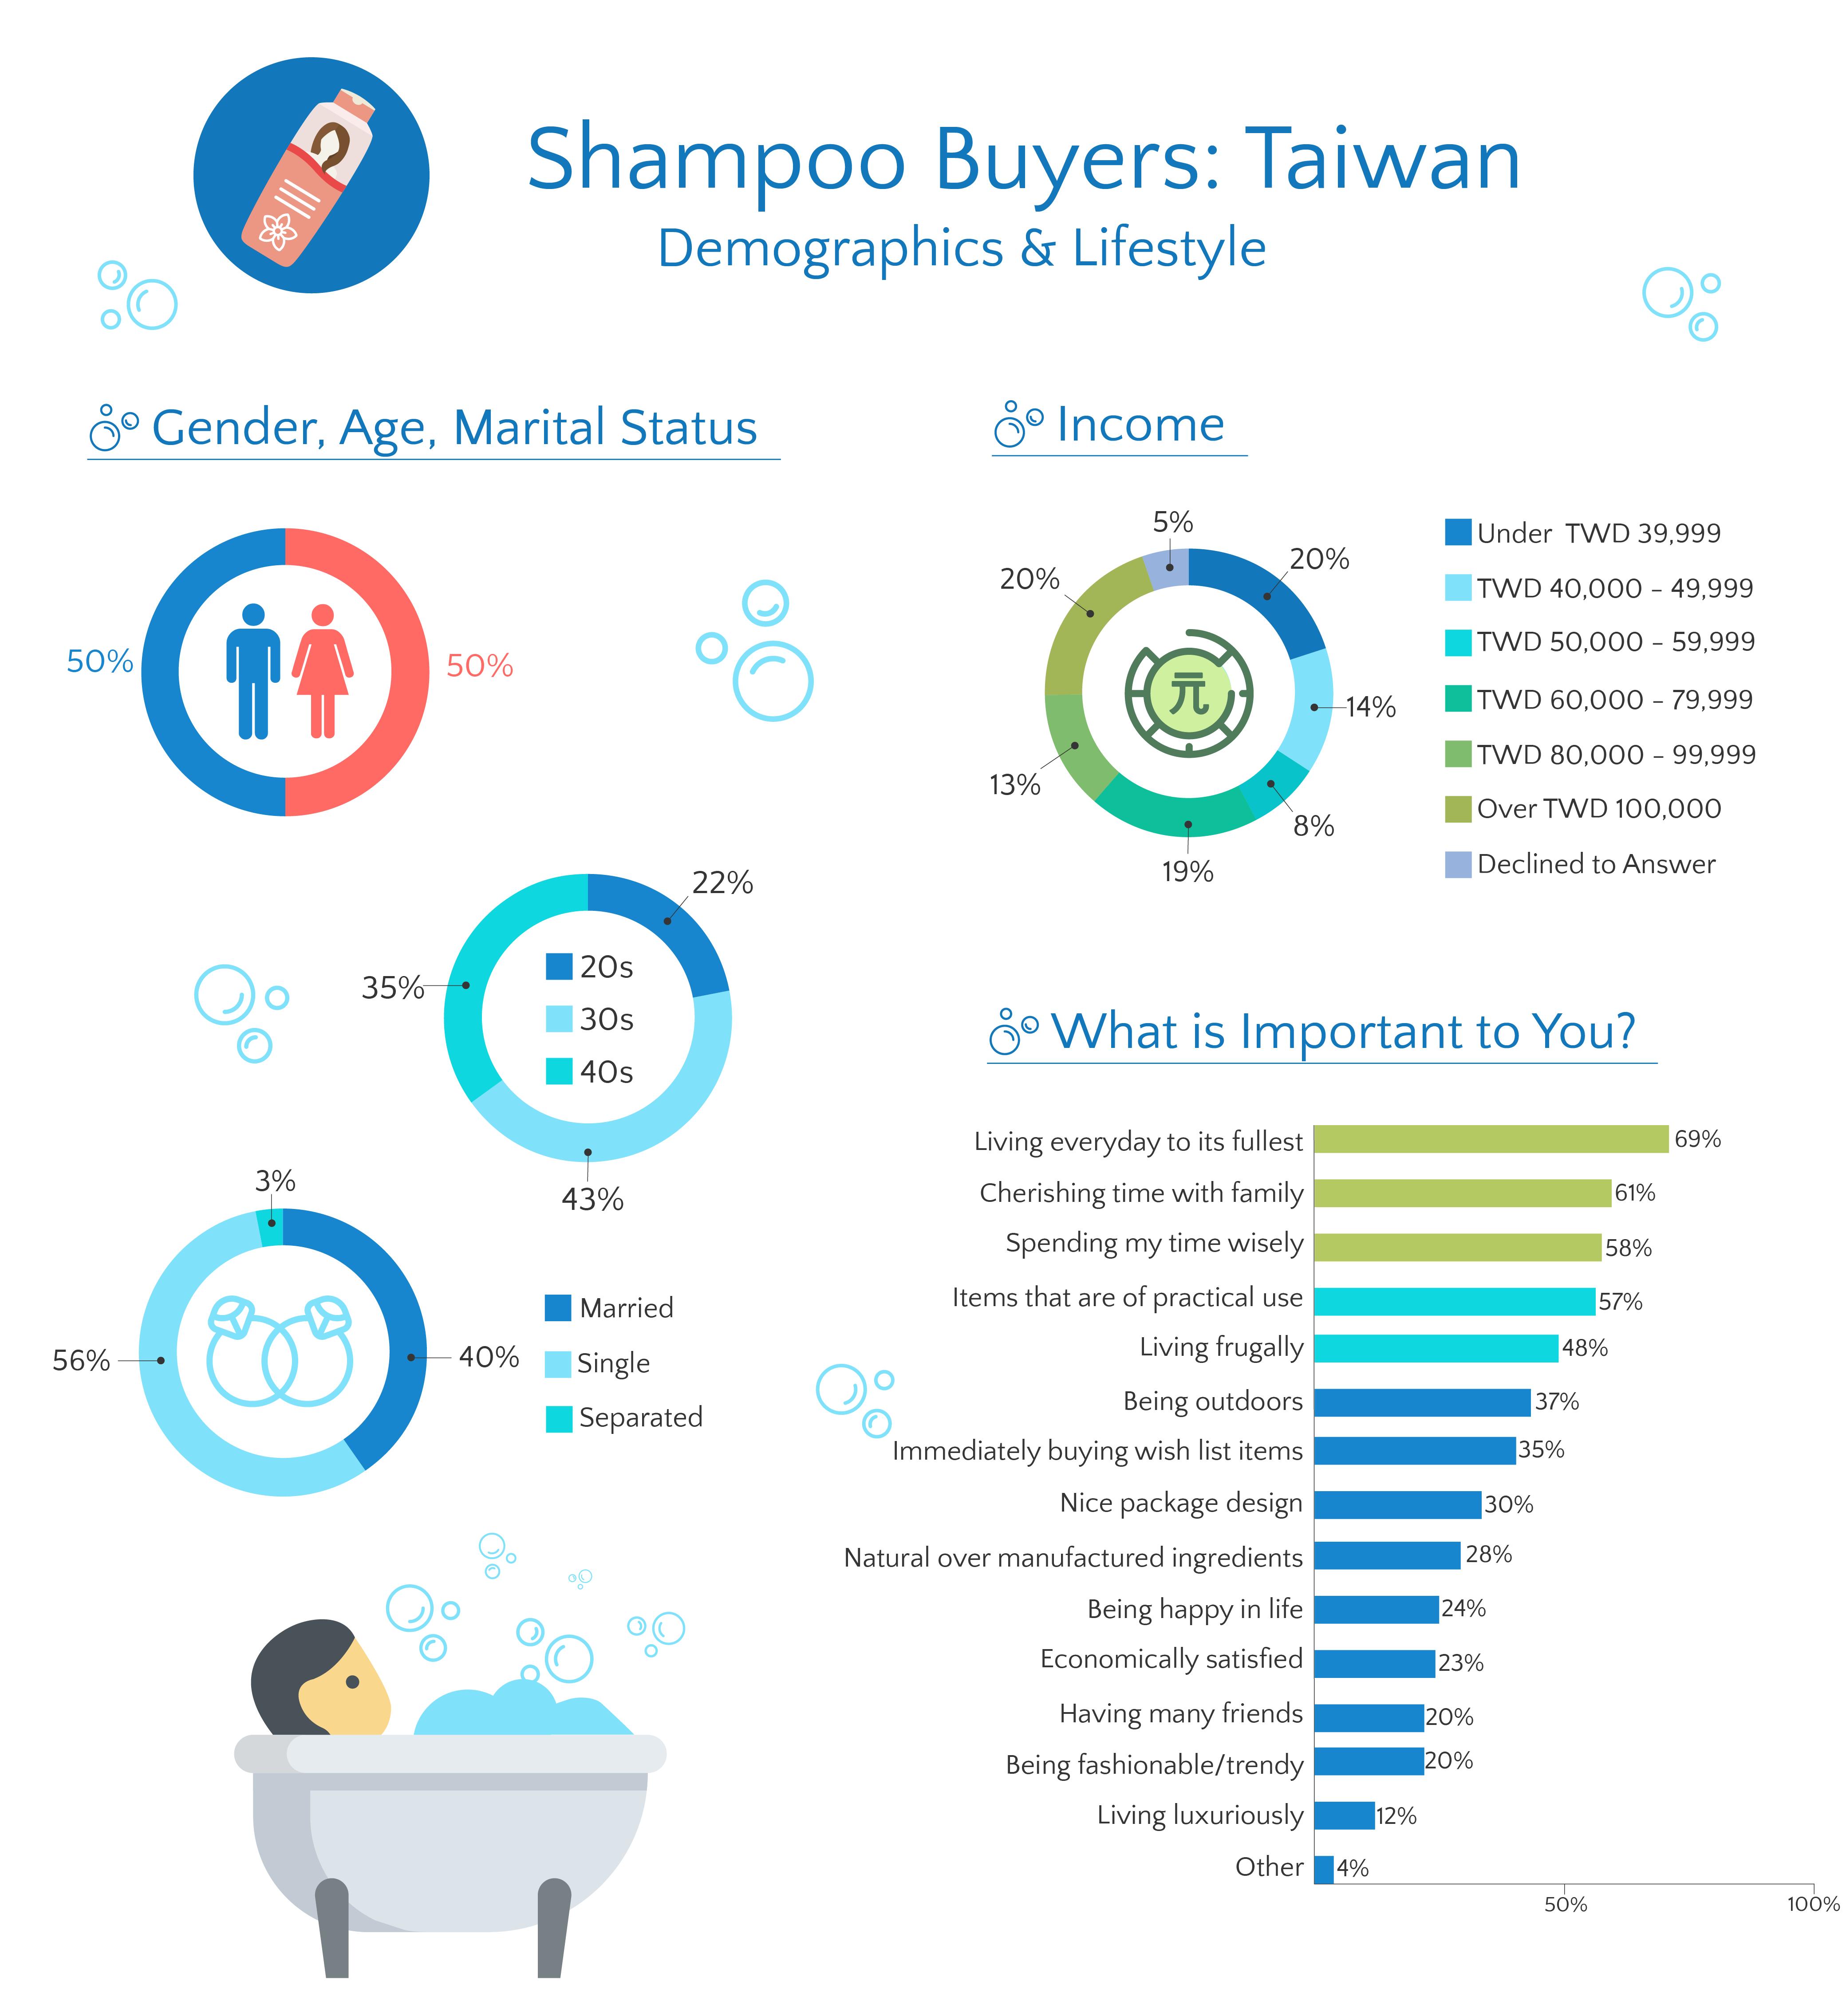 Taiwan Shampoo infographic demographic & lifestyle